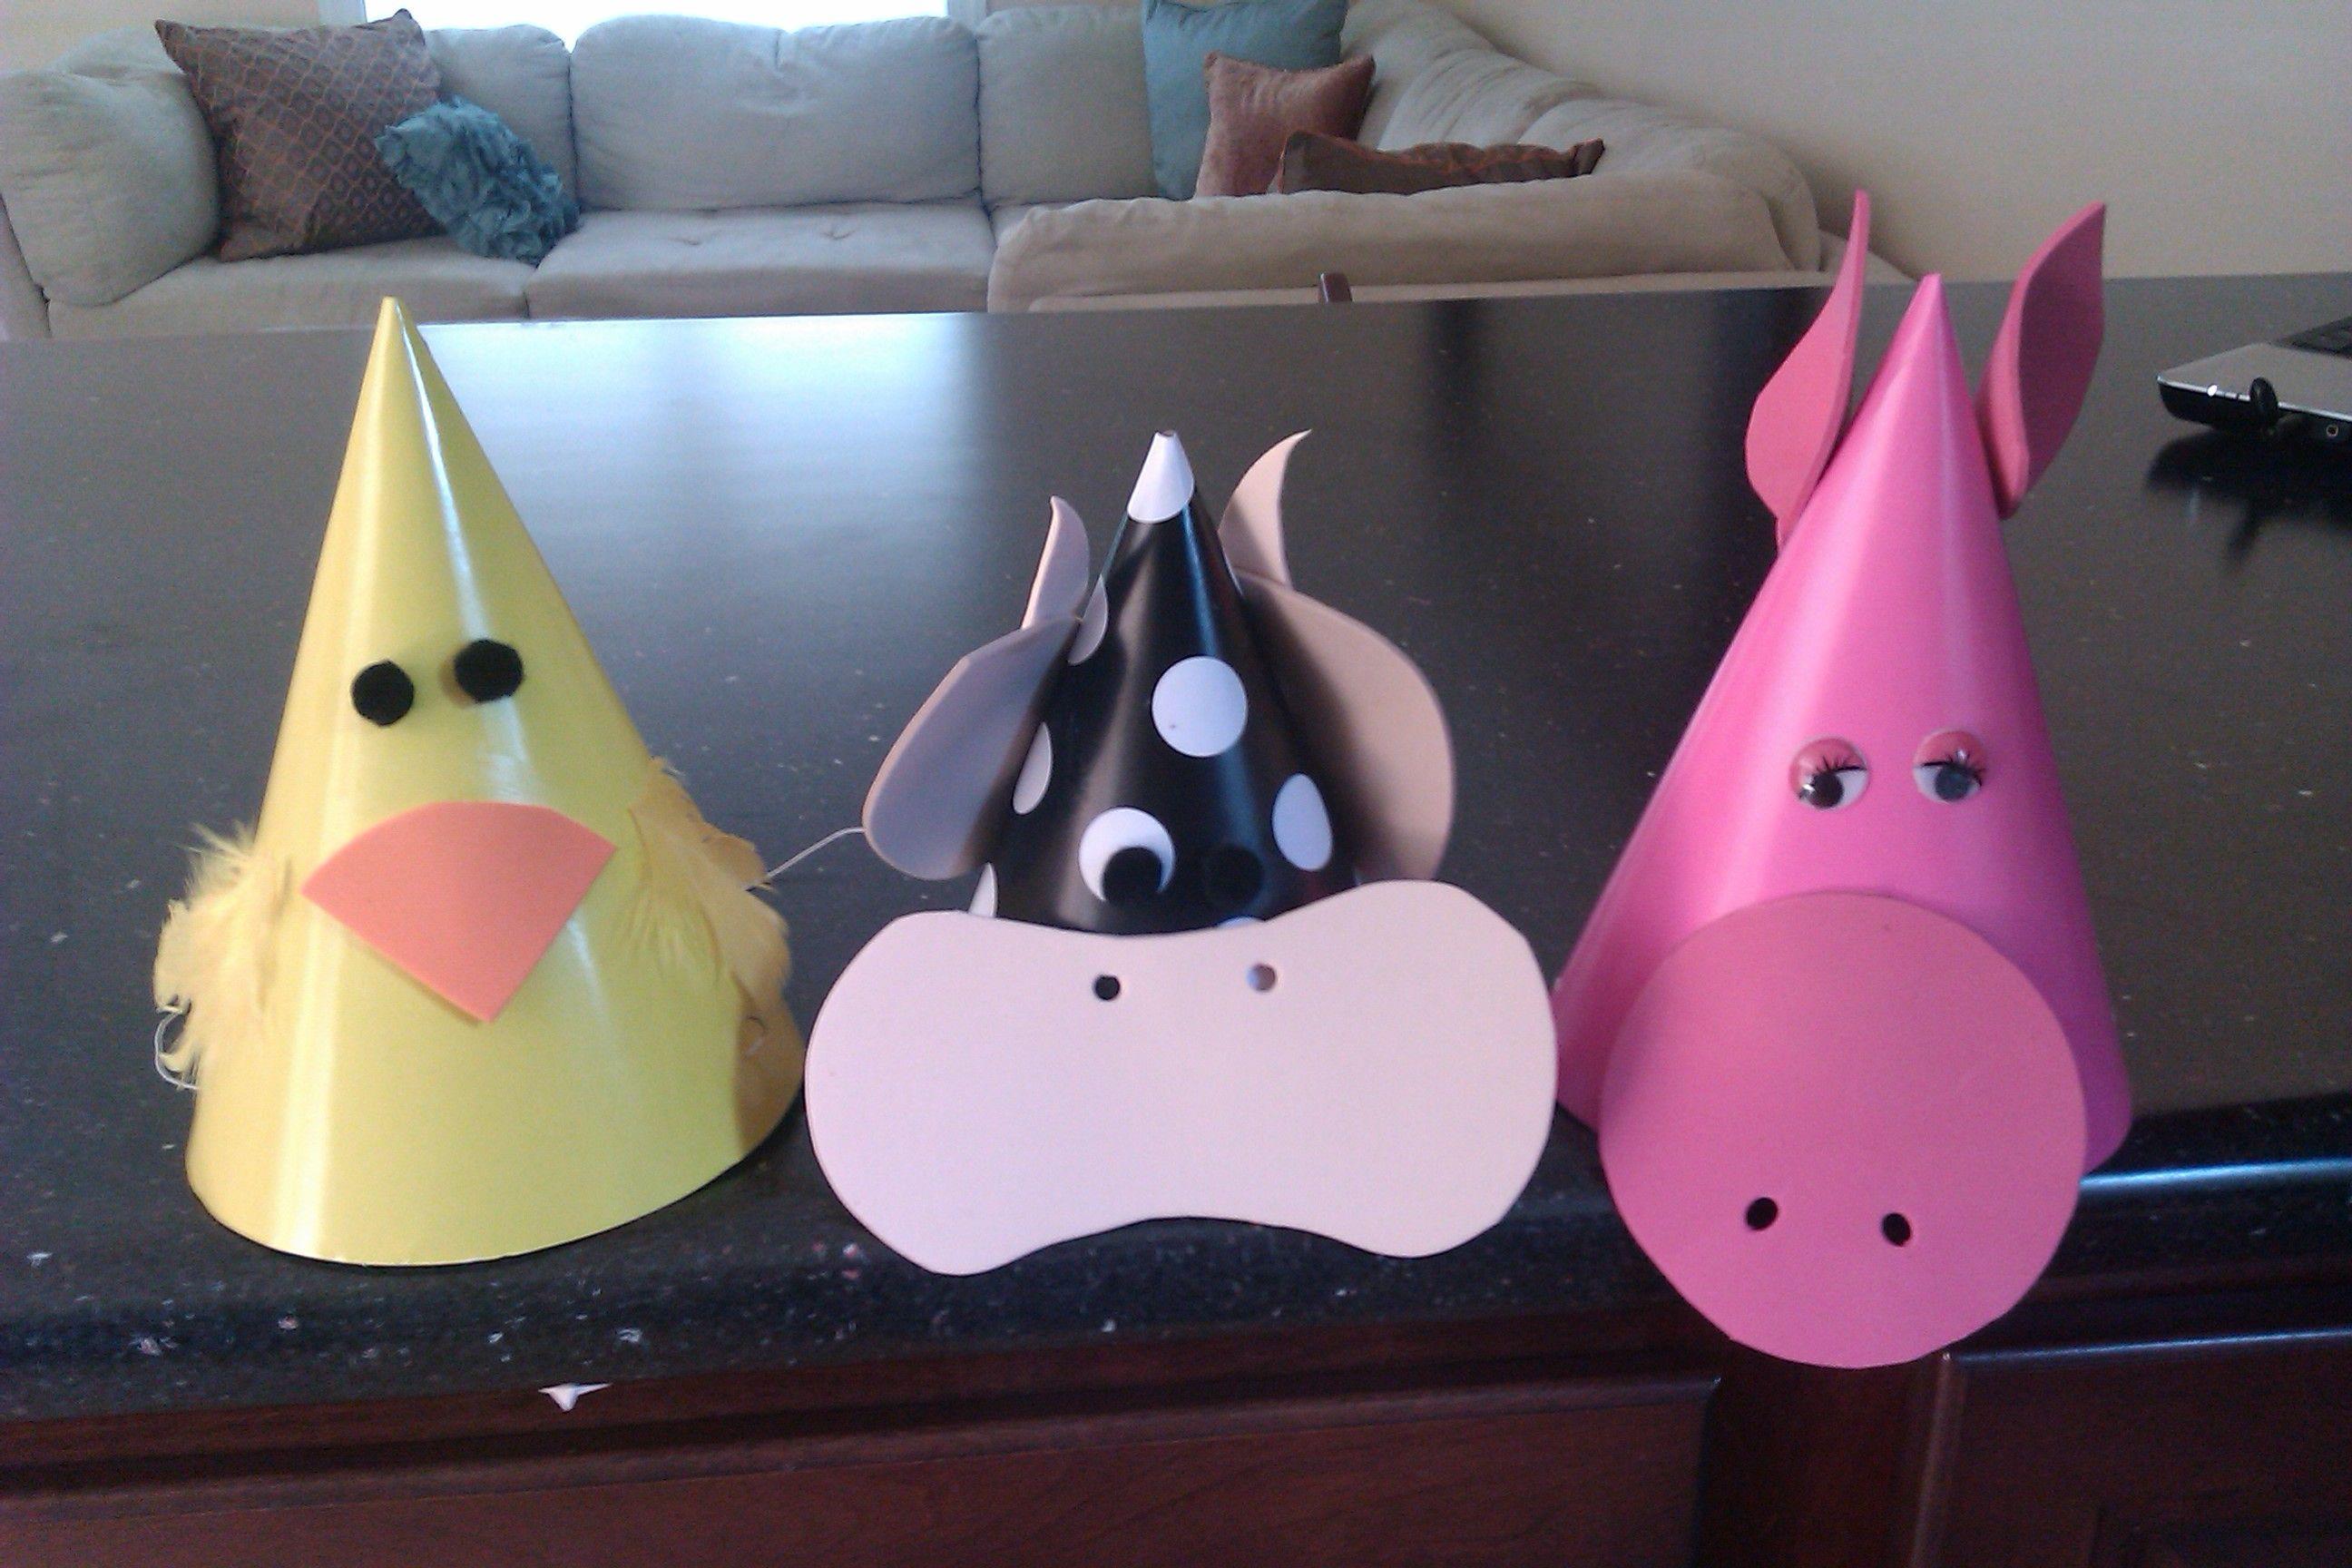 Crazy Craft Ideas For Kids Part - 21: Crazy DIY Hats